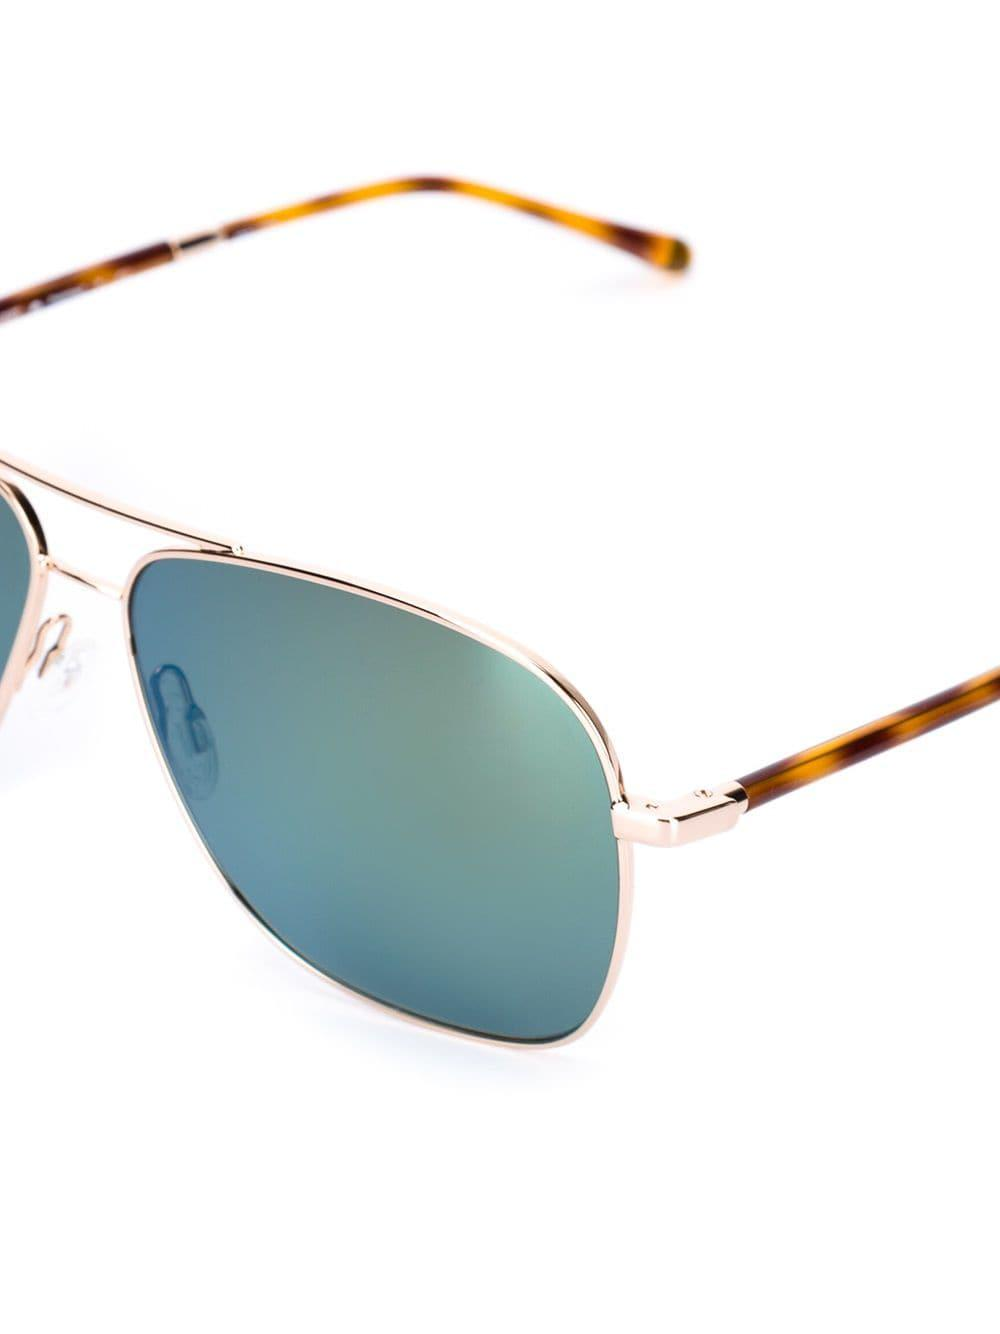 Oliver Peoples Strummer Sunglasses in Metallic (Blue)